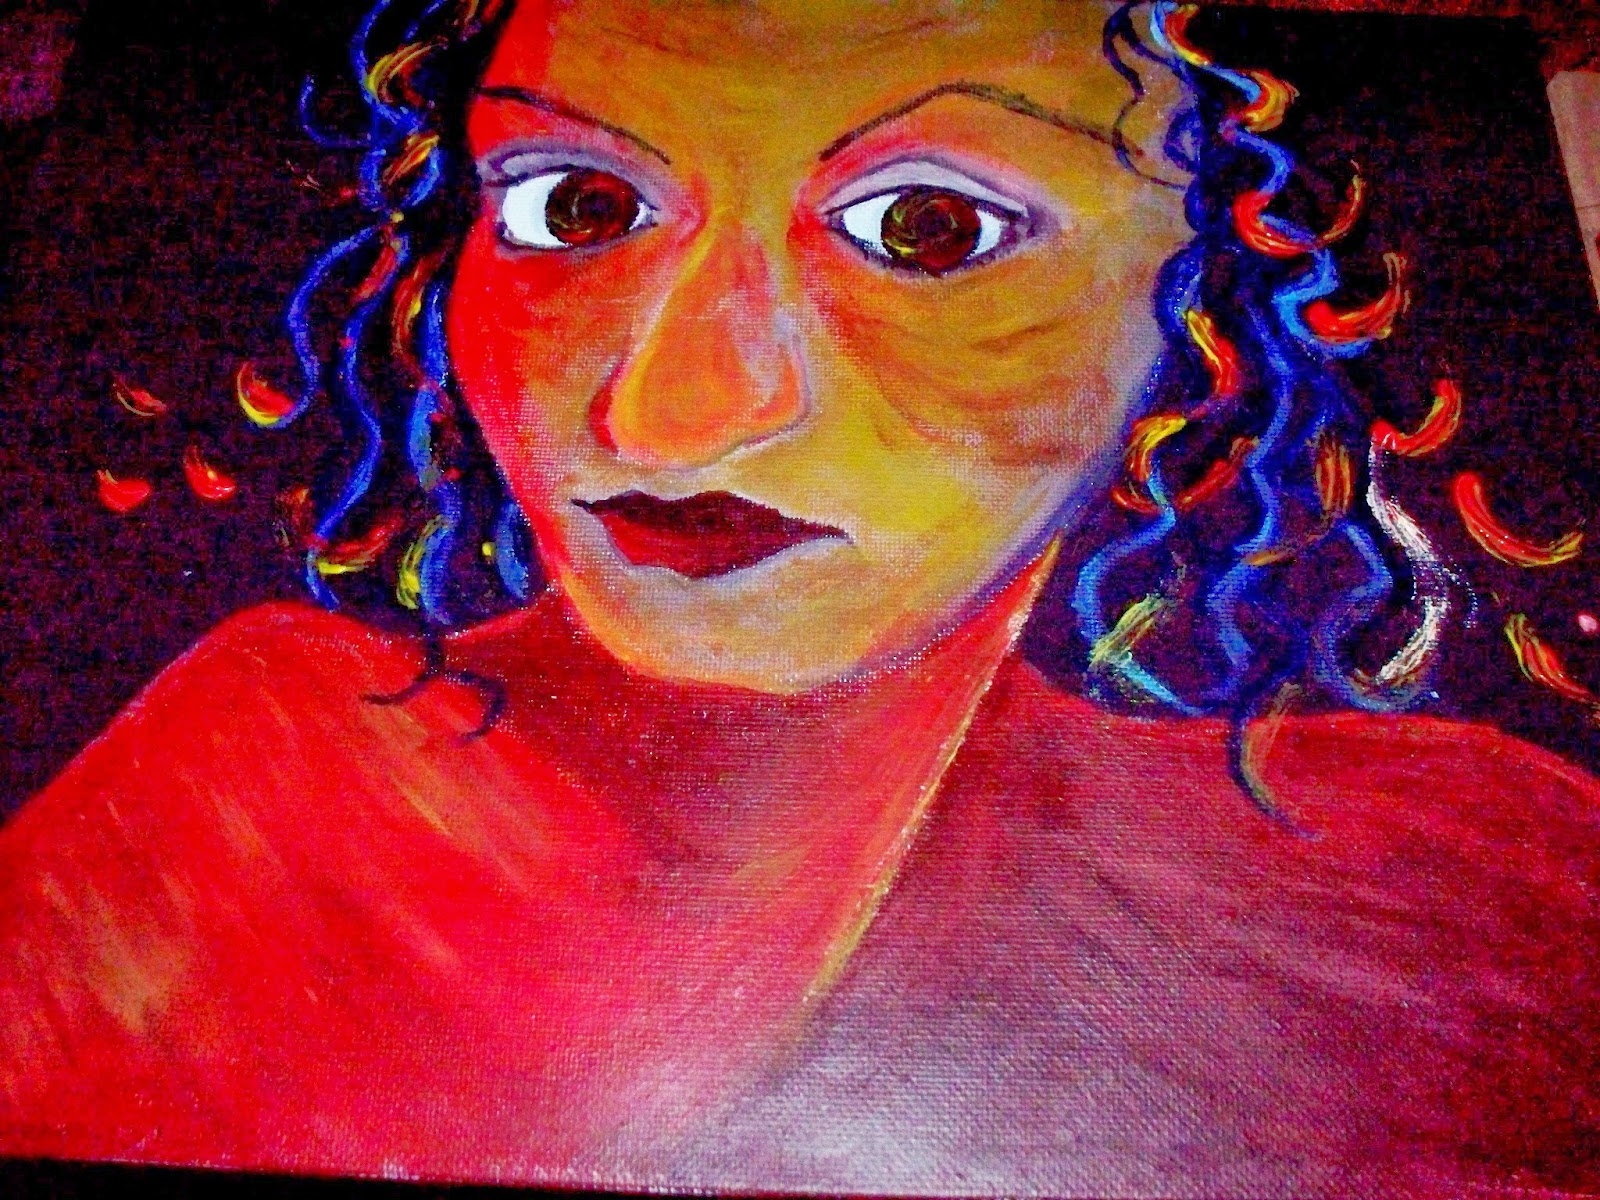 Colorful Portrait of a woman